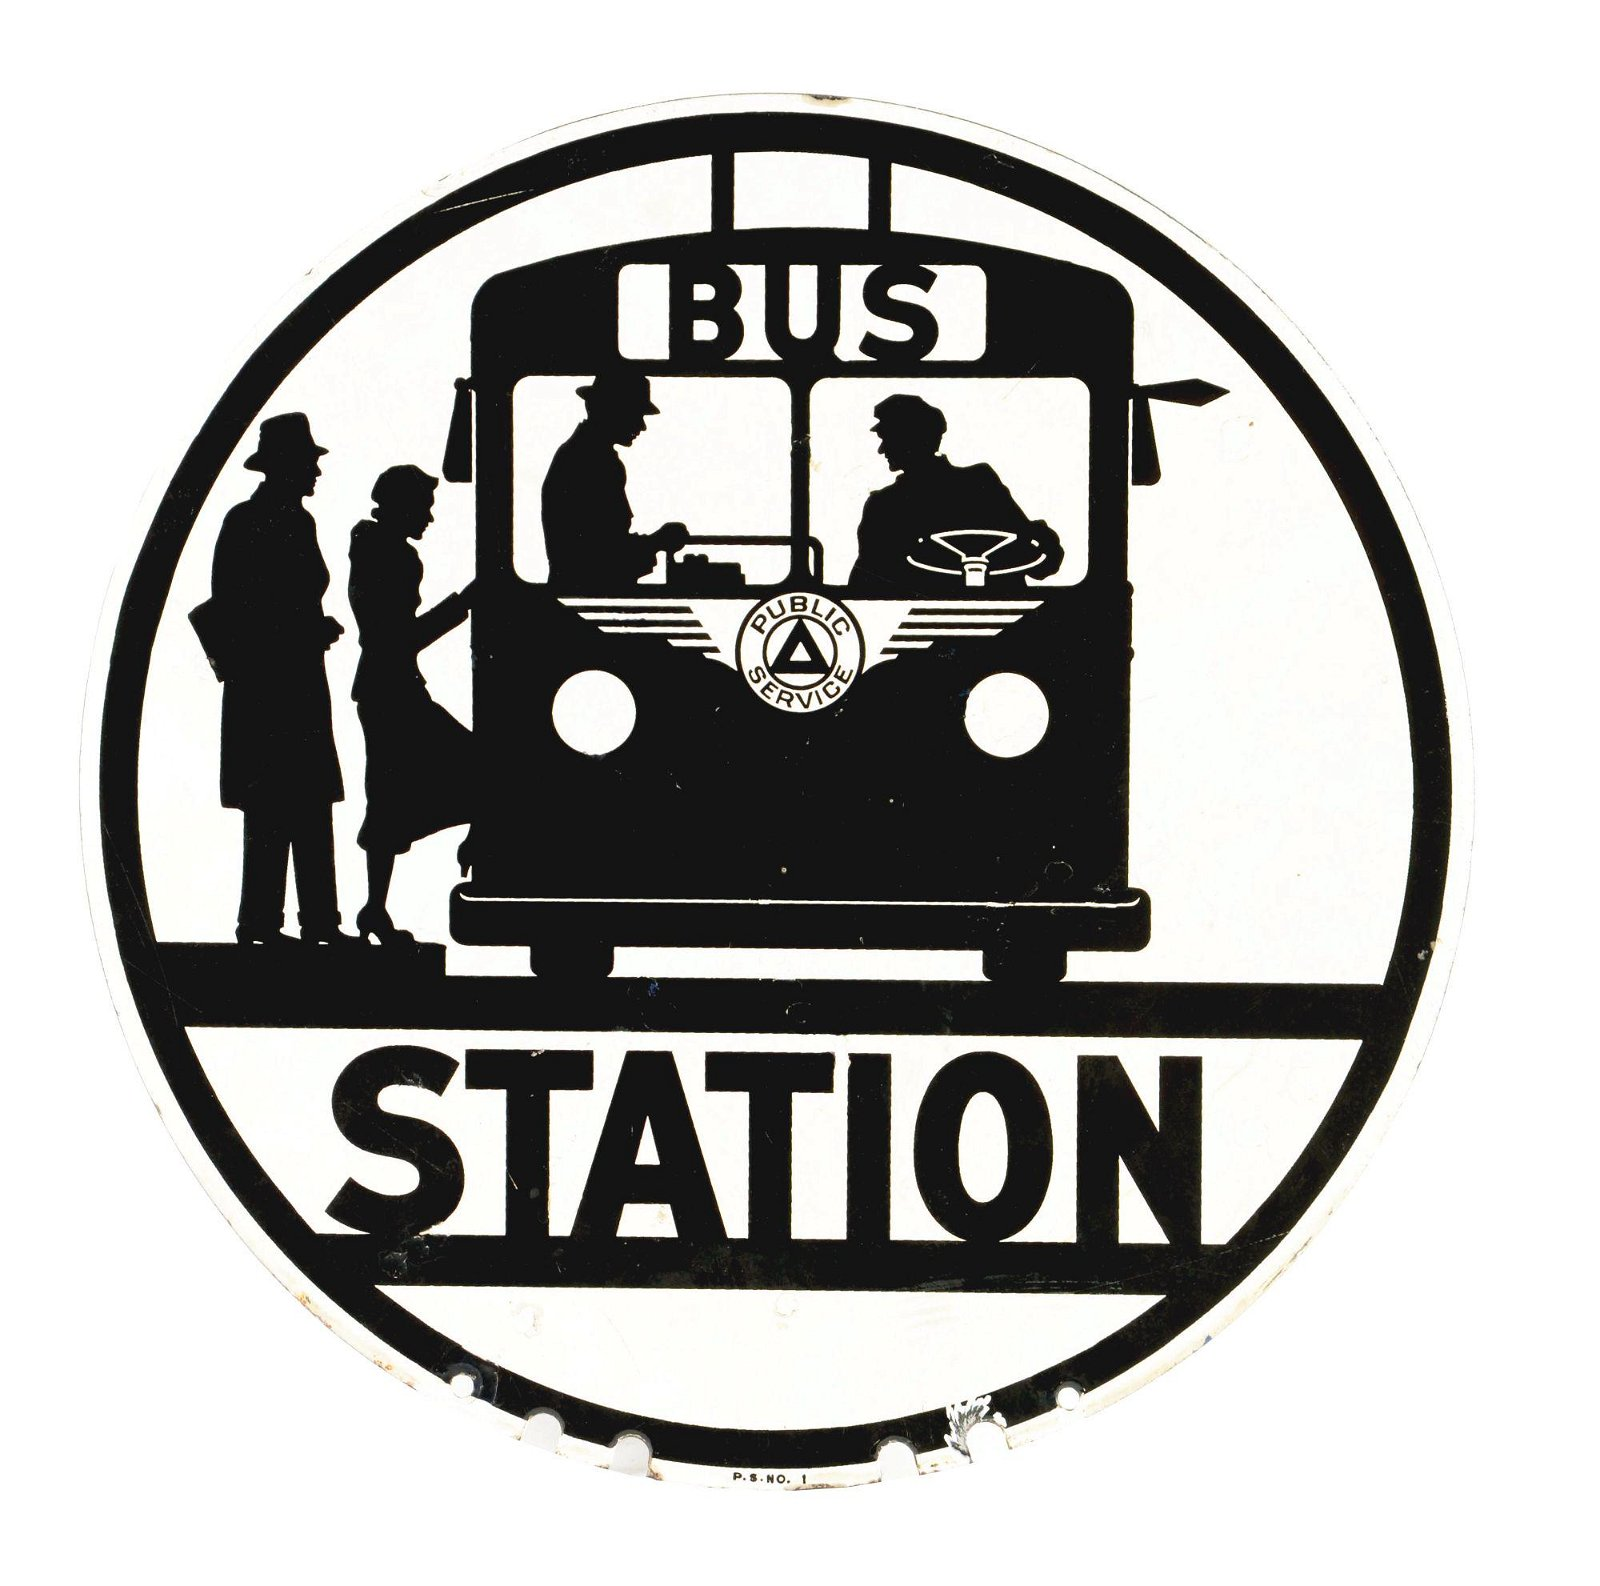 Bus Station Porcelain Sign W/ Bus Graphic.